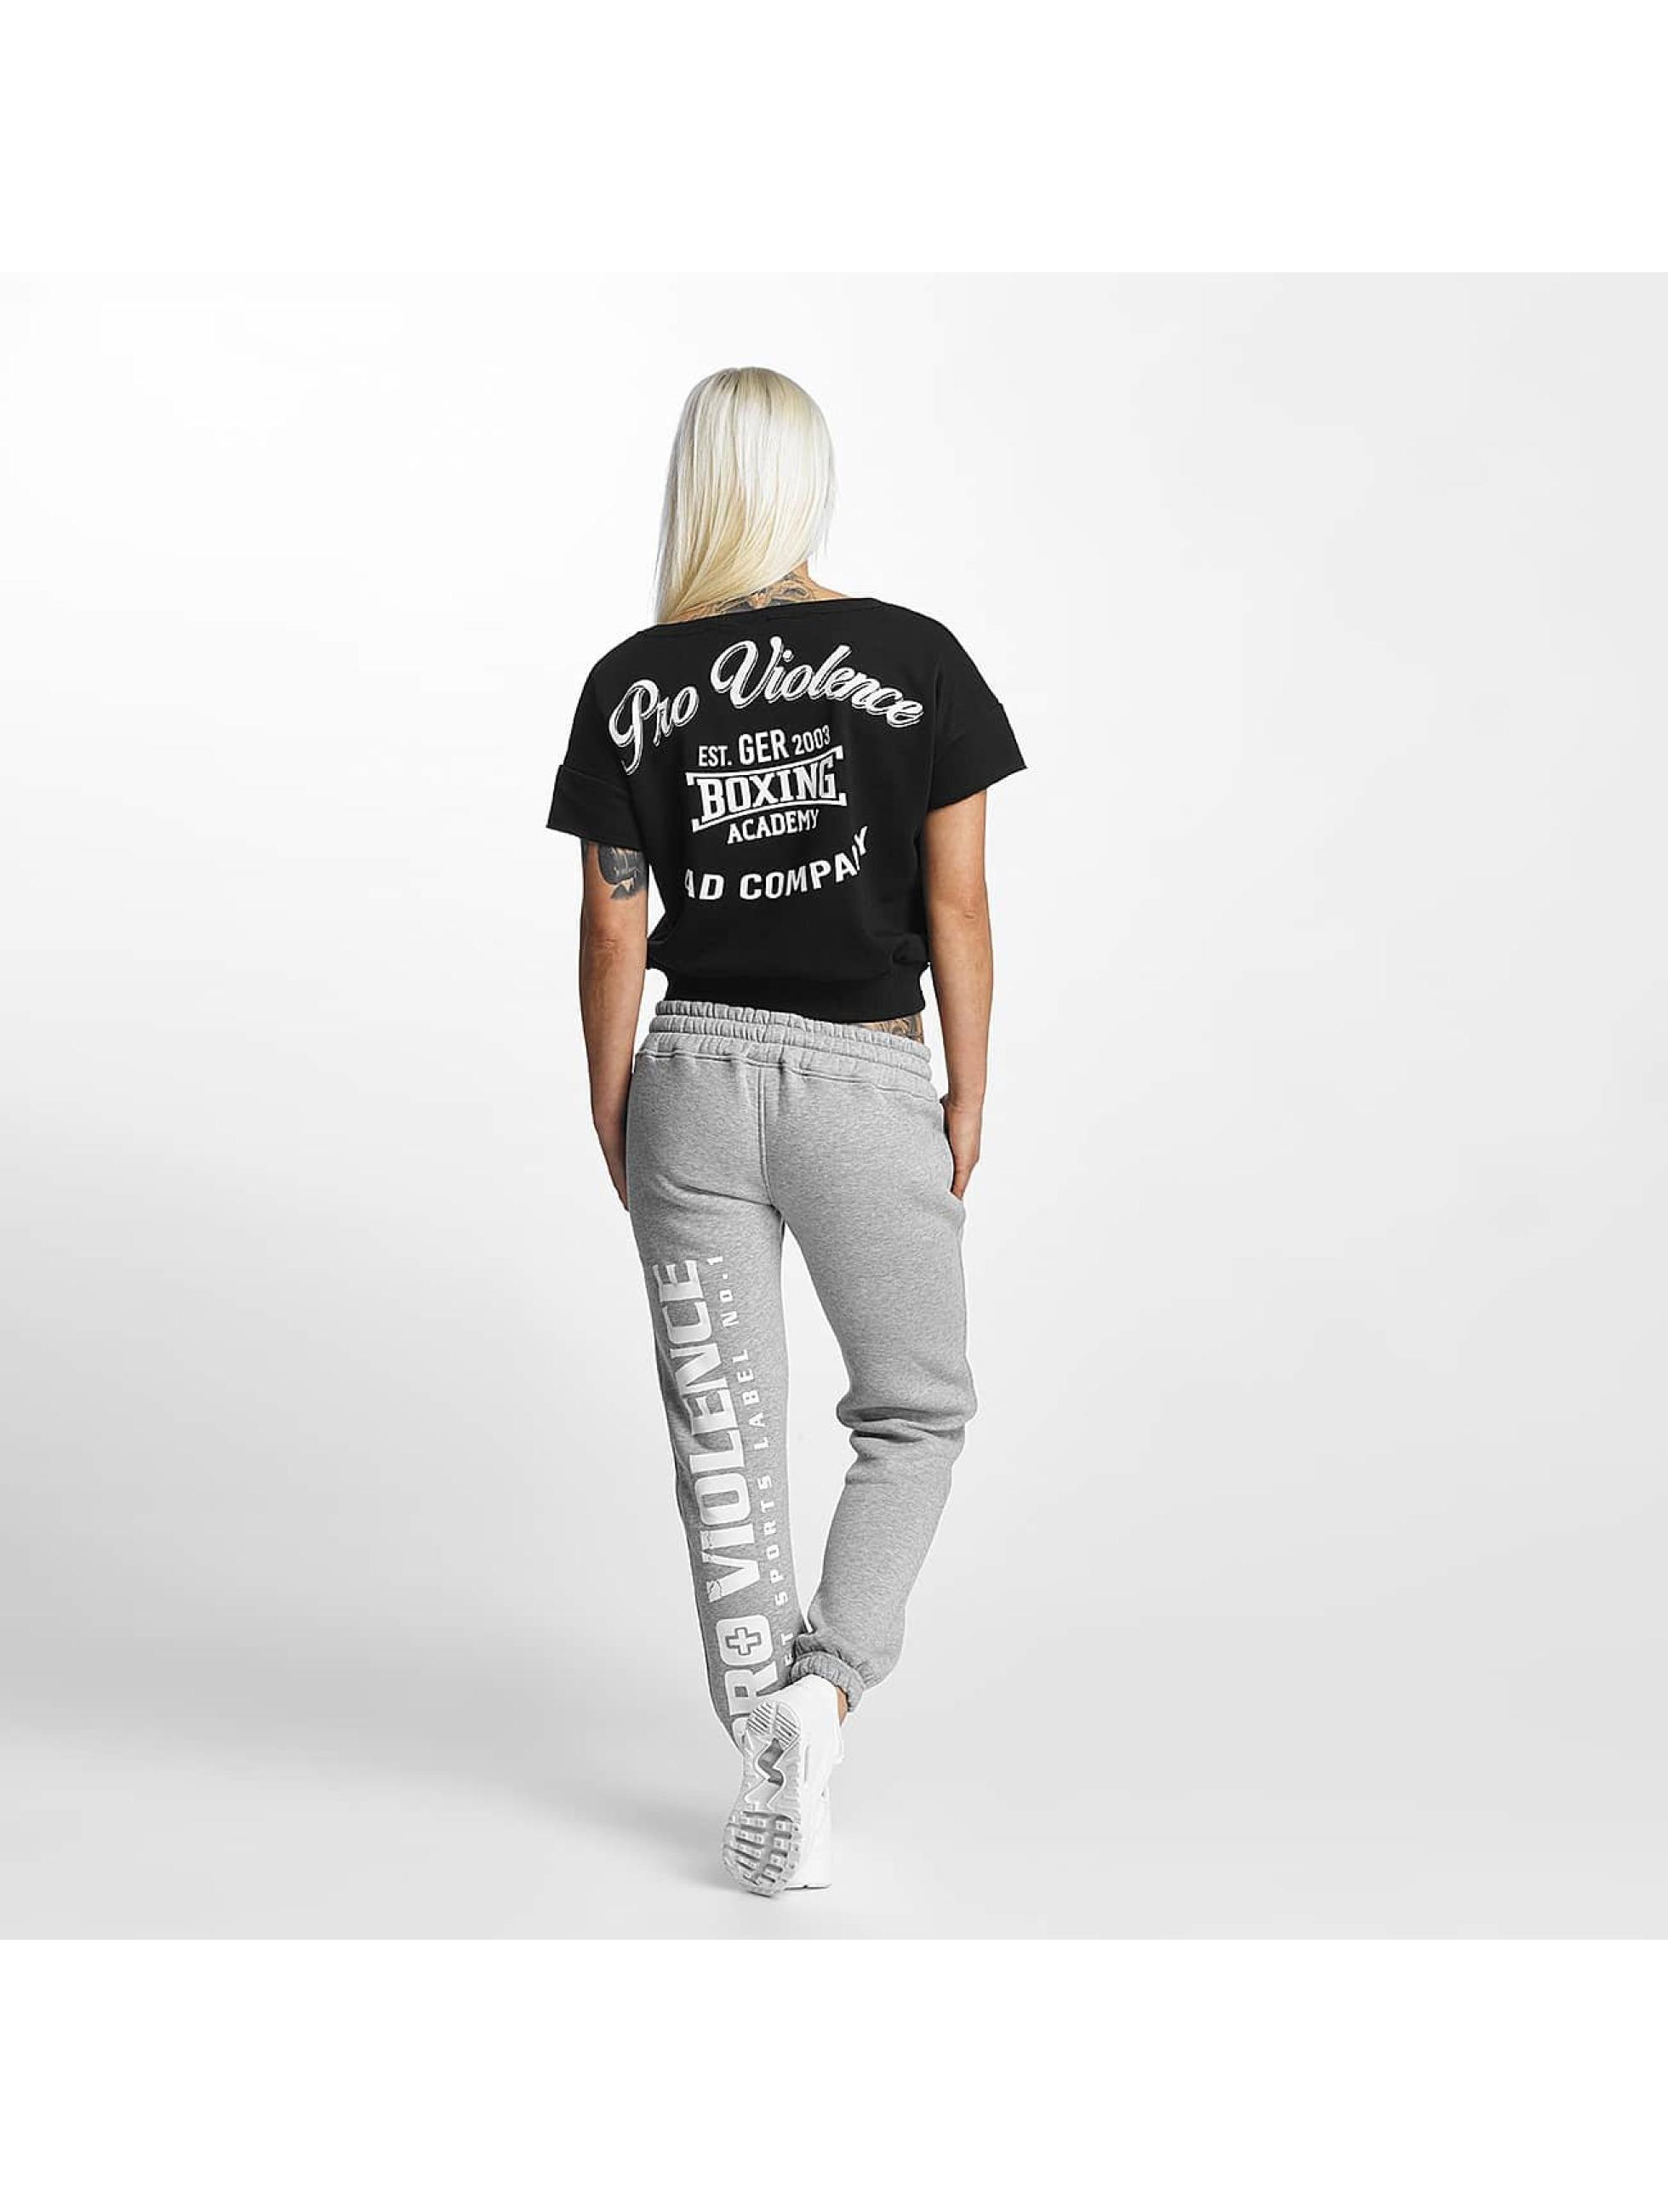 Pro Violence Streetwear T-Shirt Boxing black